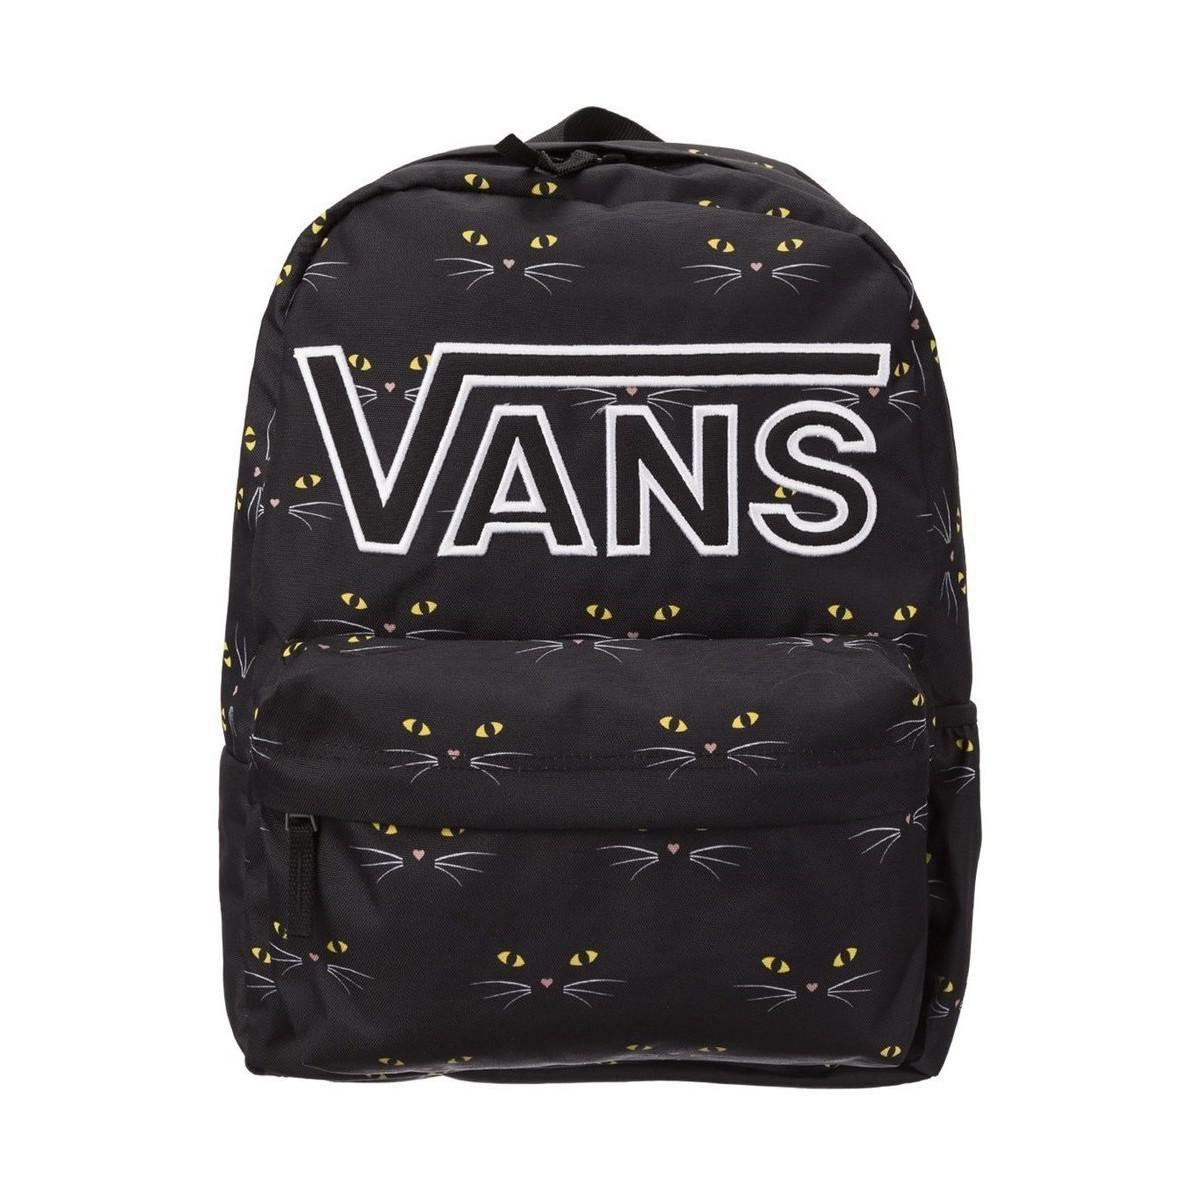 f2e66d8c81079 Vans Realm Flying V Ba Black Cat Women s Backpack In Black in Black ...